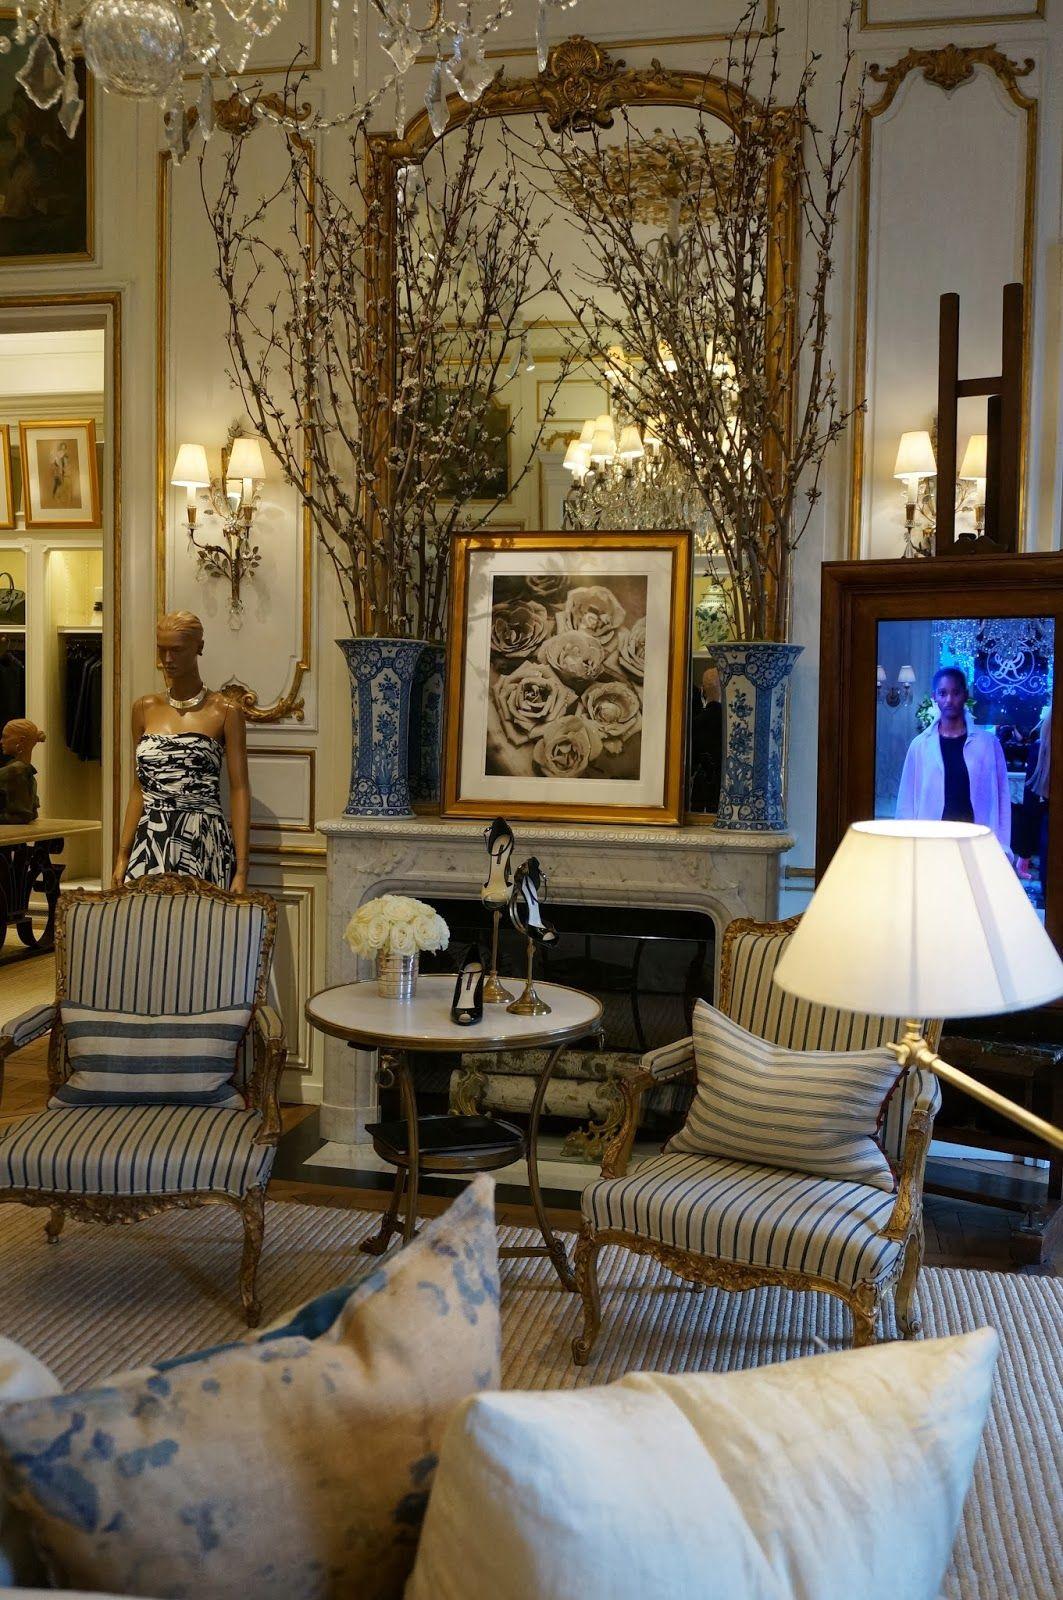 vignette design ralph lauren in paris the best of both. Black Bedroom Furniture Sets. Home Design Ideas